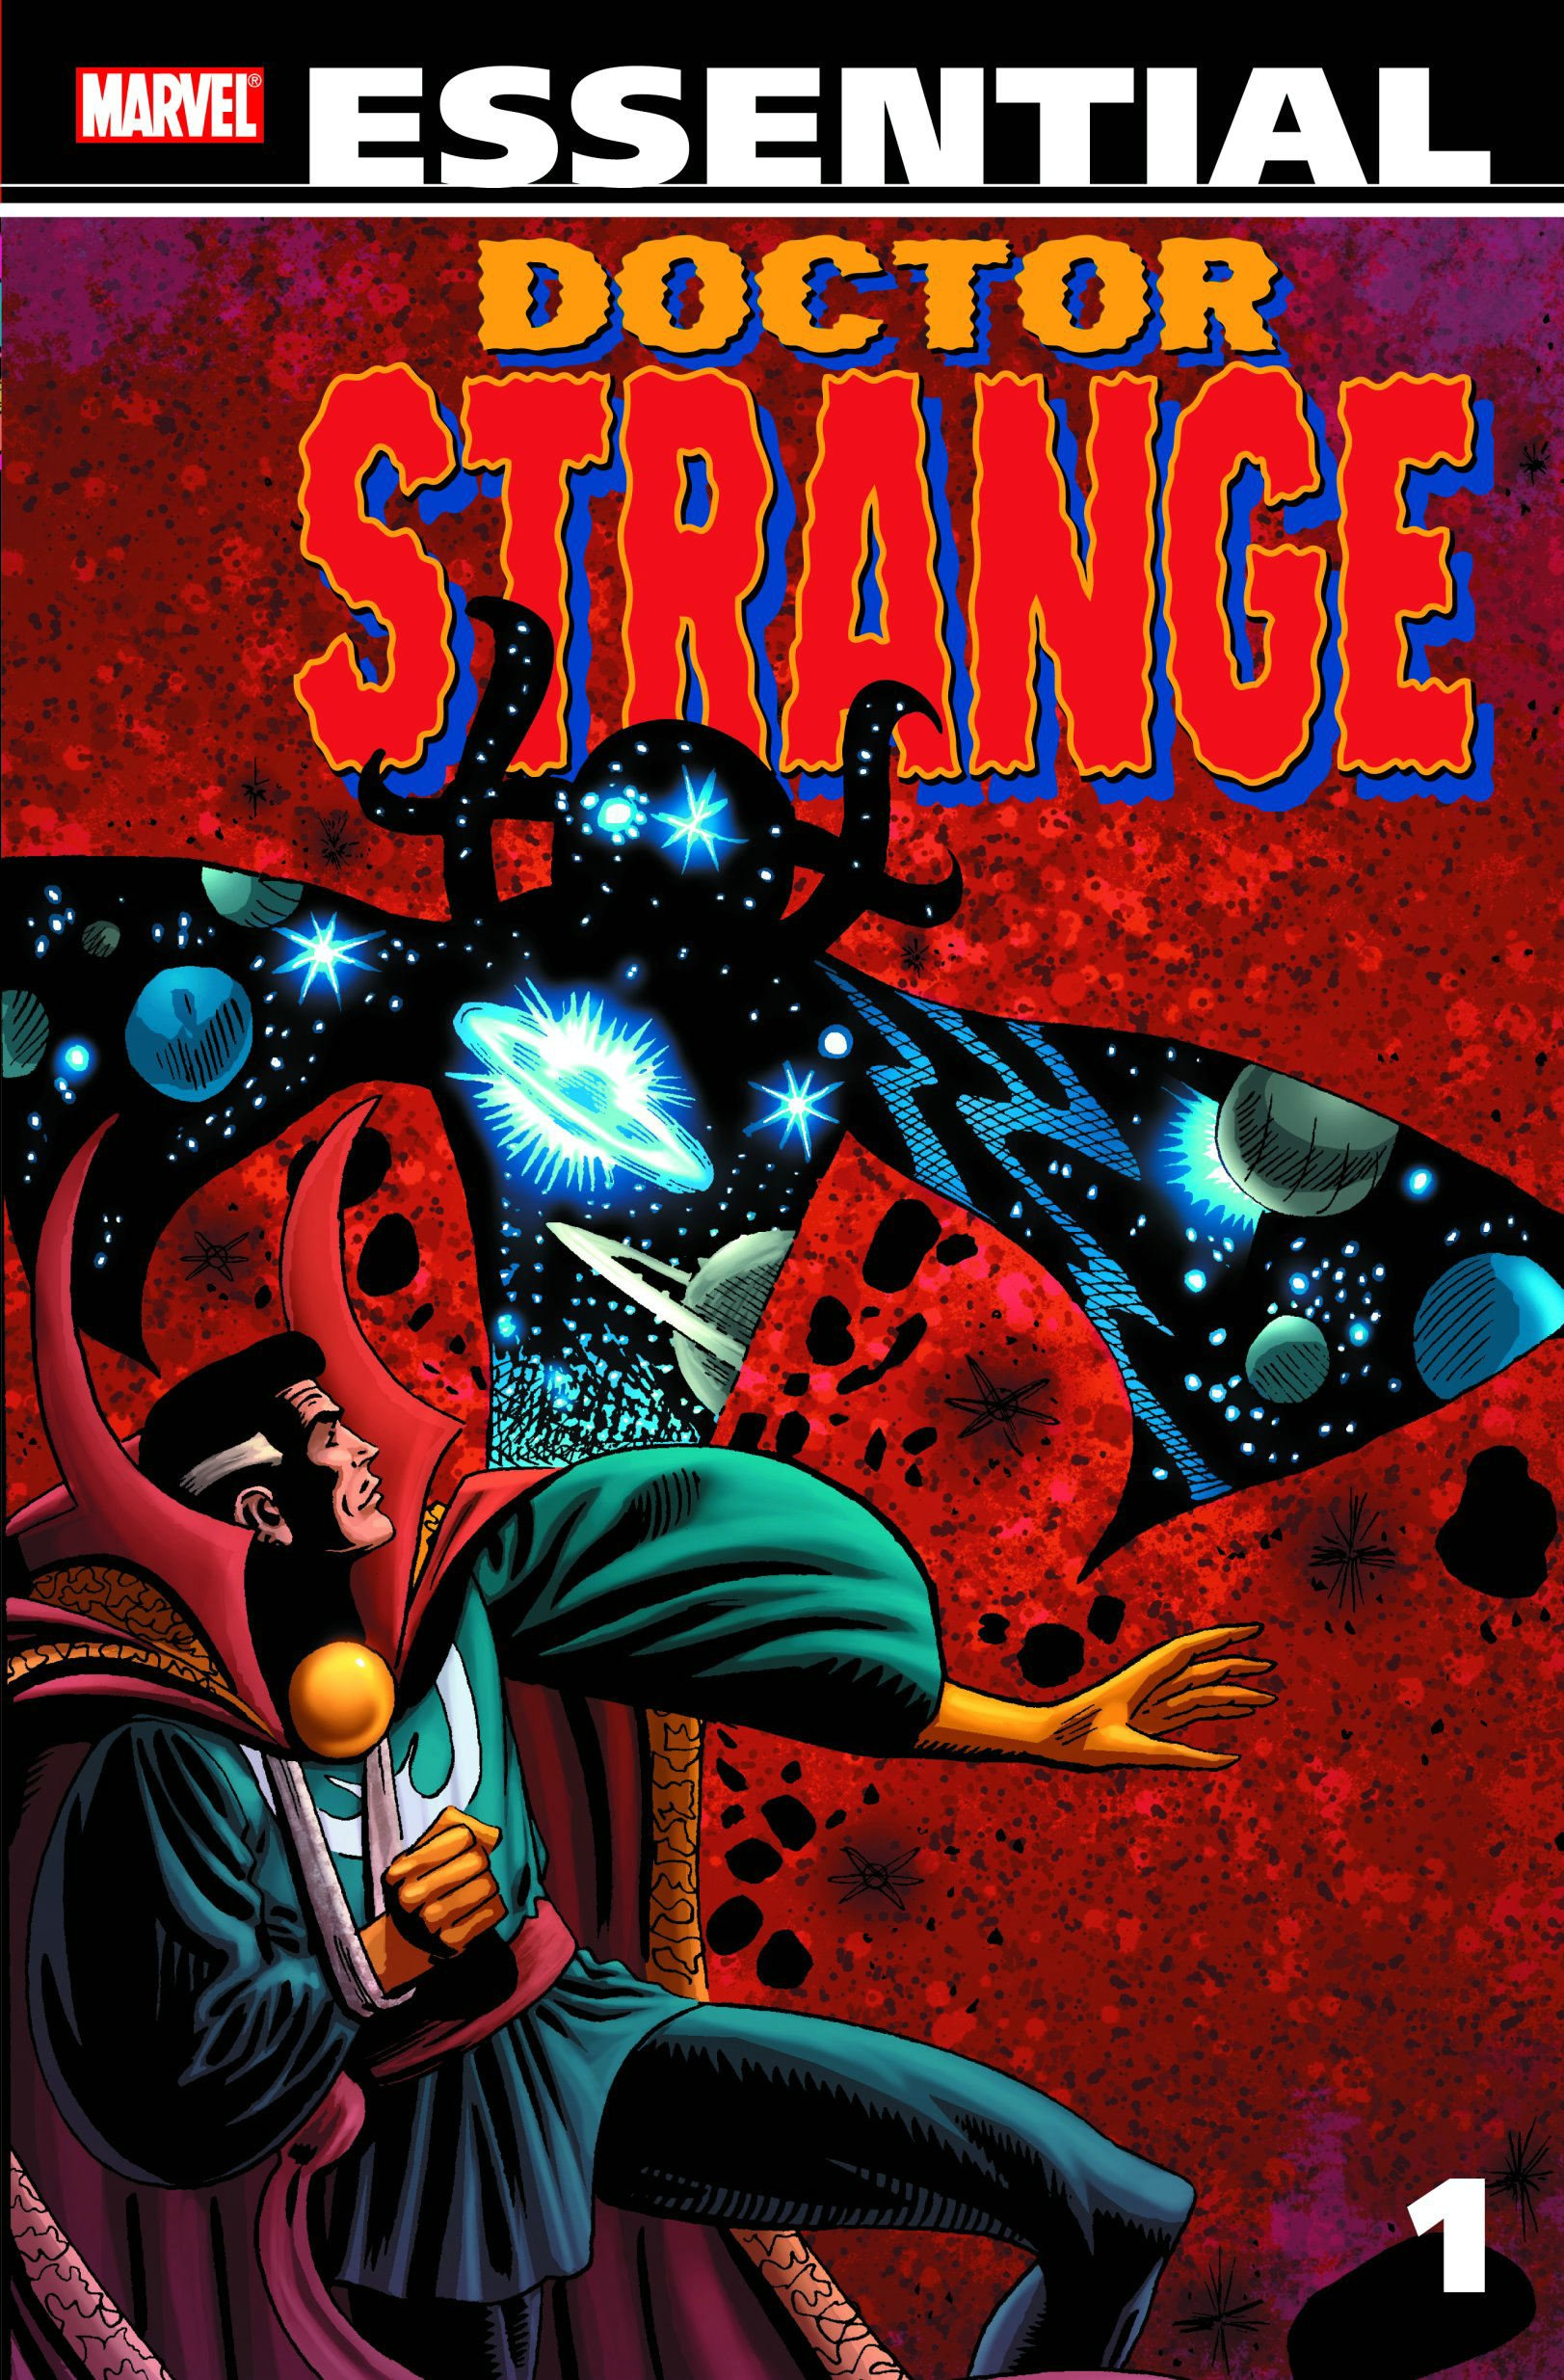 Read Online Essential Doctor Strange, Vol. 1 (Marvel Essentials) pdf epub